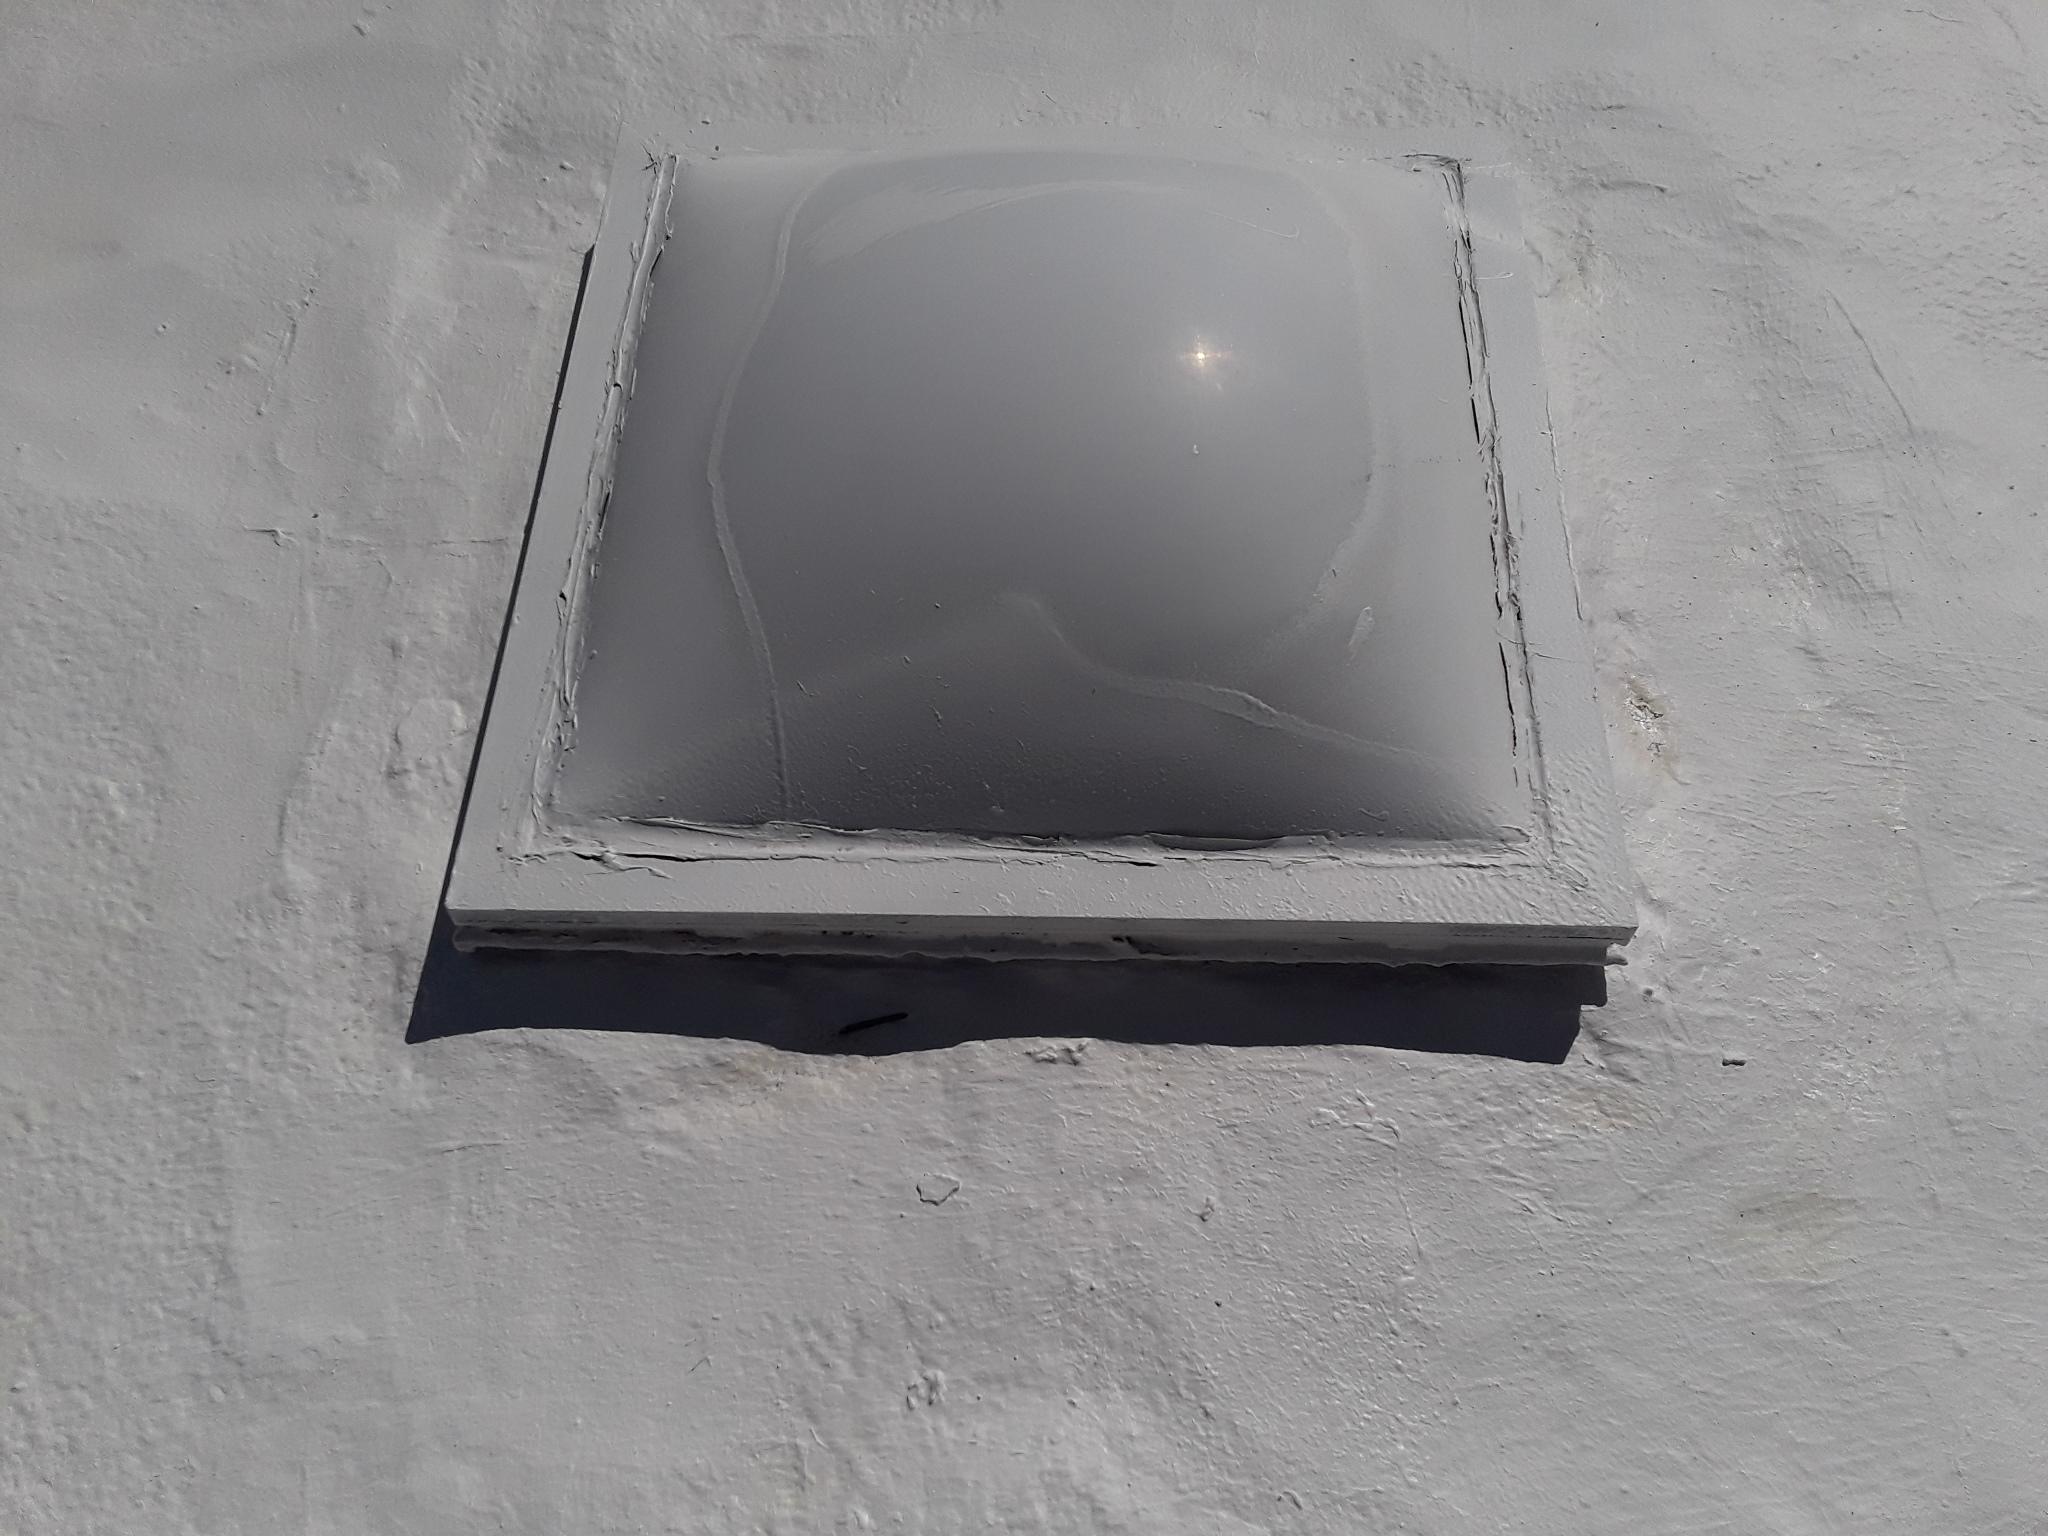 Old Skylight Dome Change, No Screws?-sky1.jpg